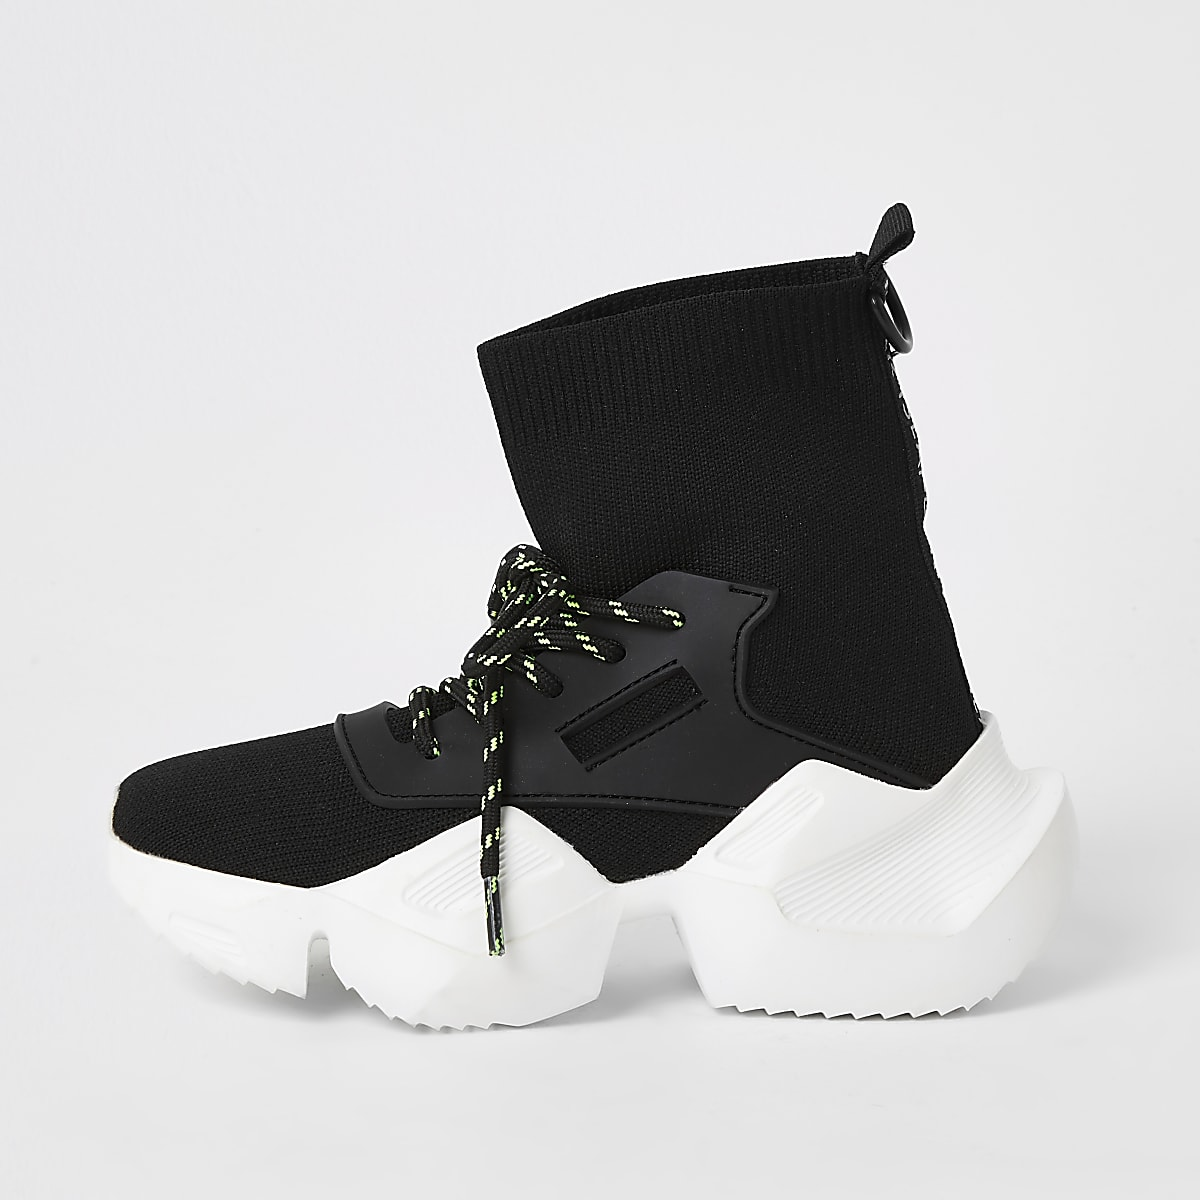 Zwarte hoge sok sneakers met vetersluiting voor kids